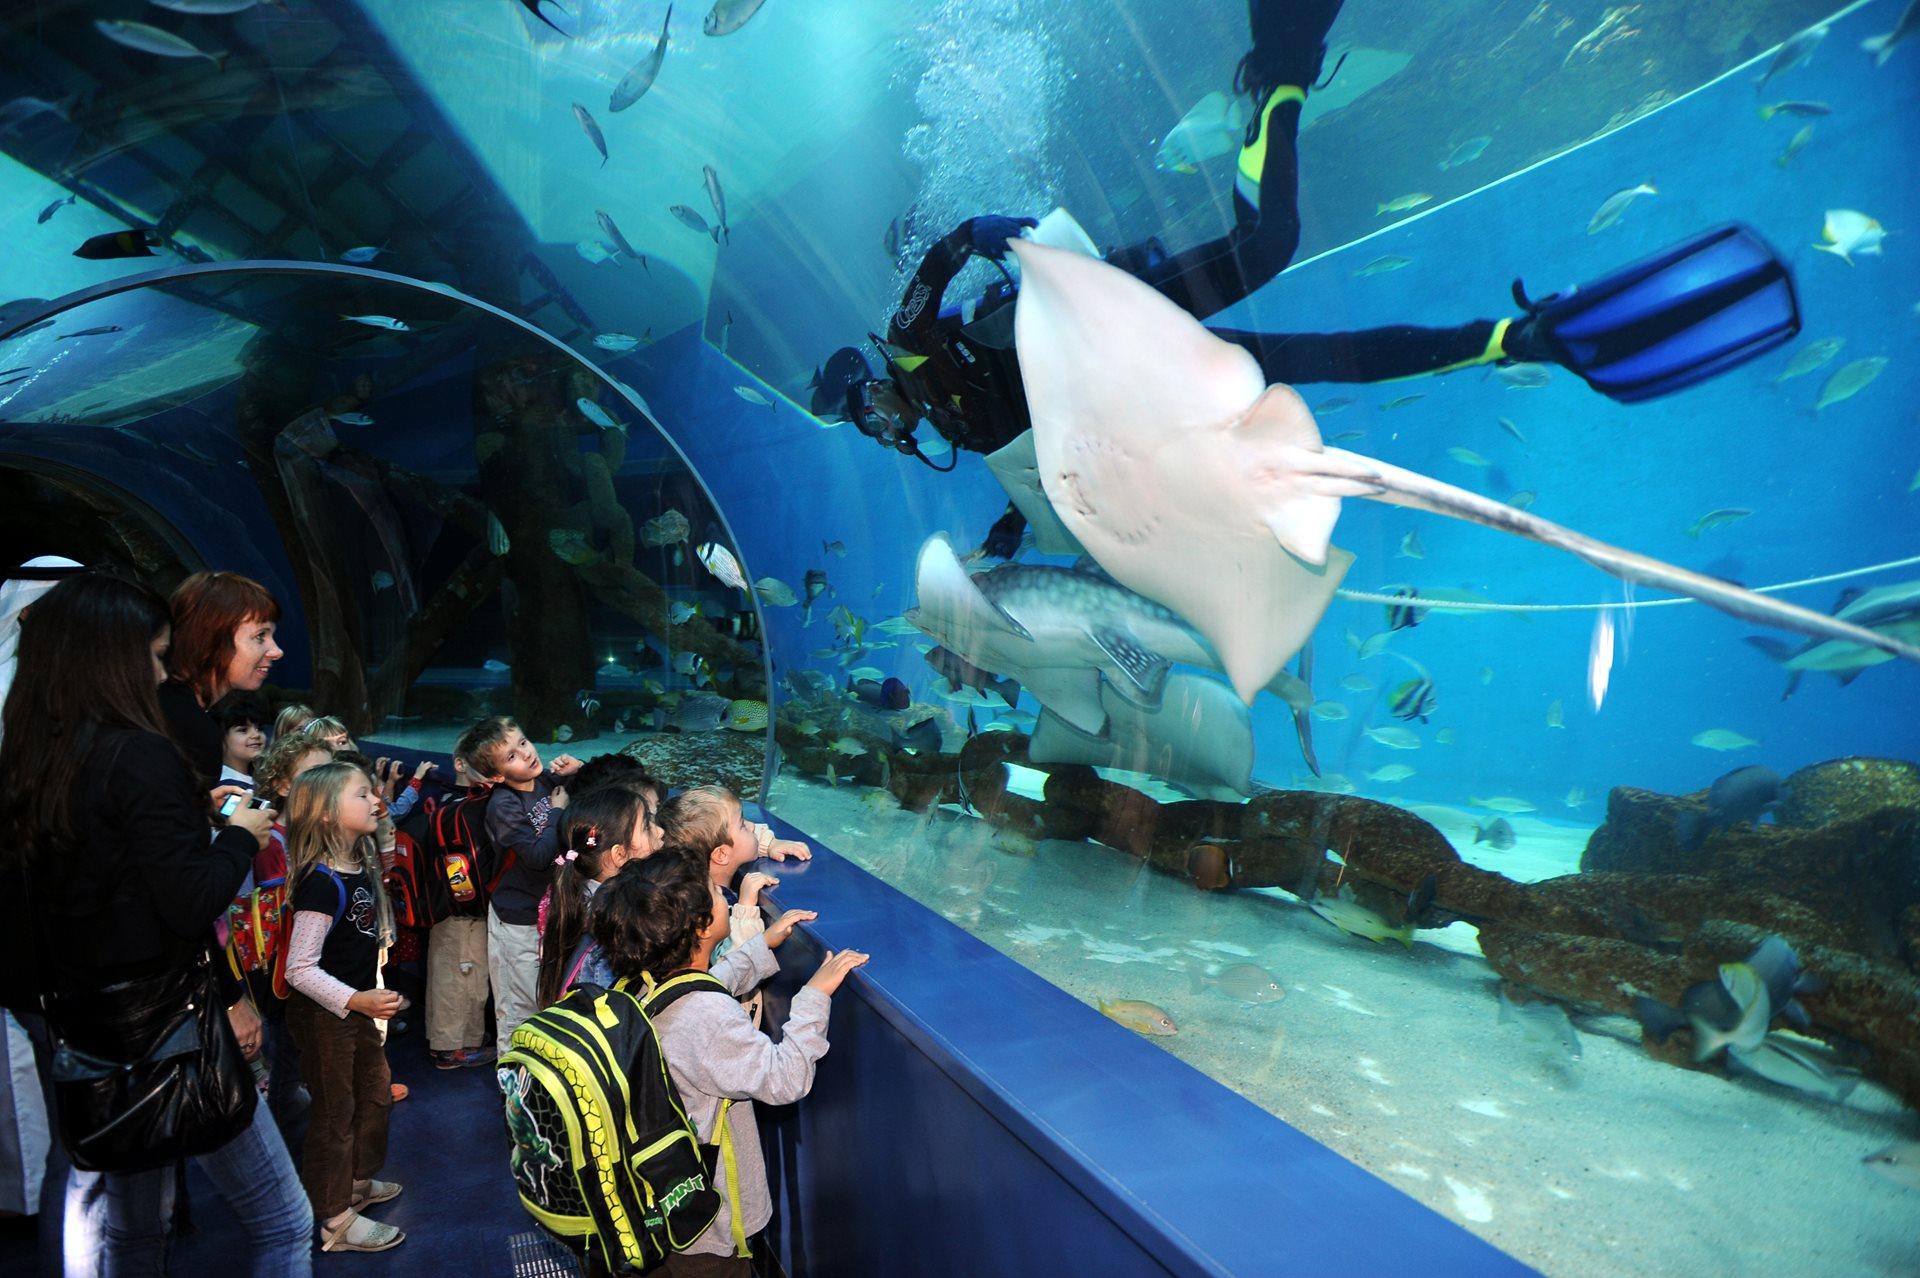 Sharjah Aquarium - Sharjah Museums Authority